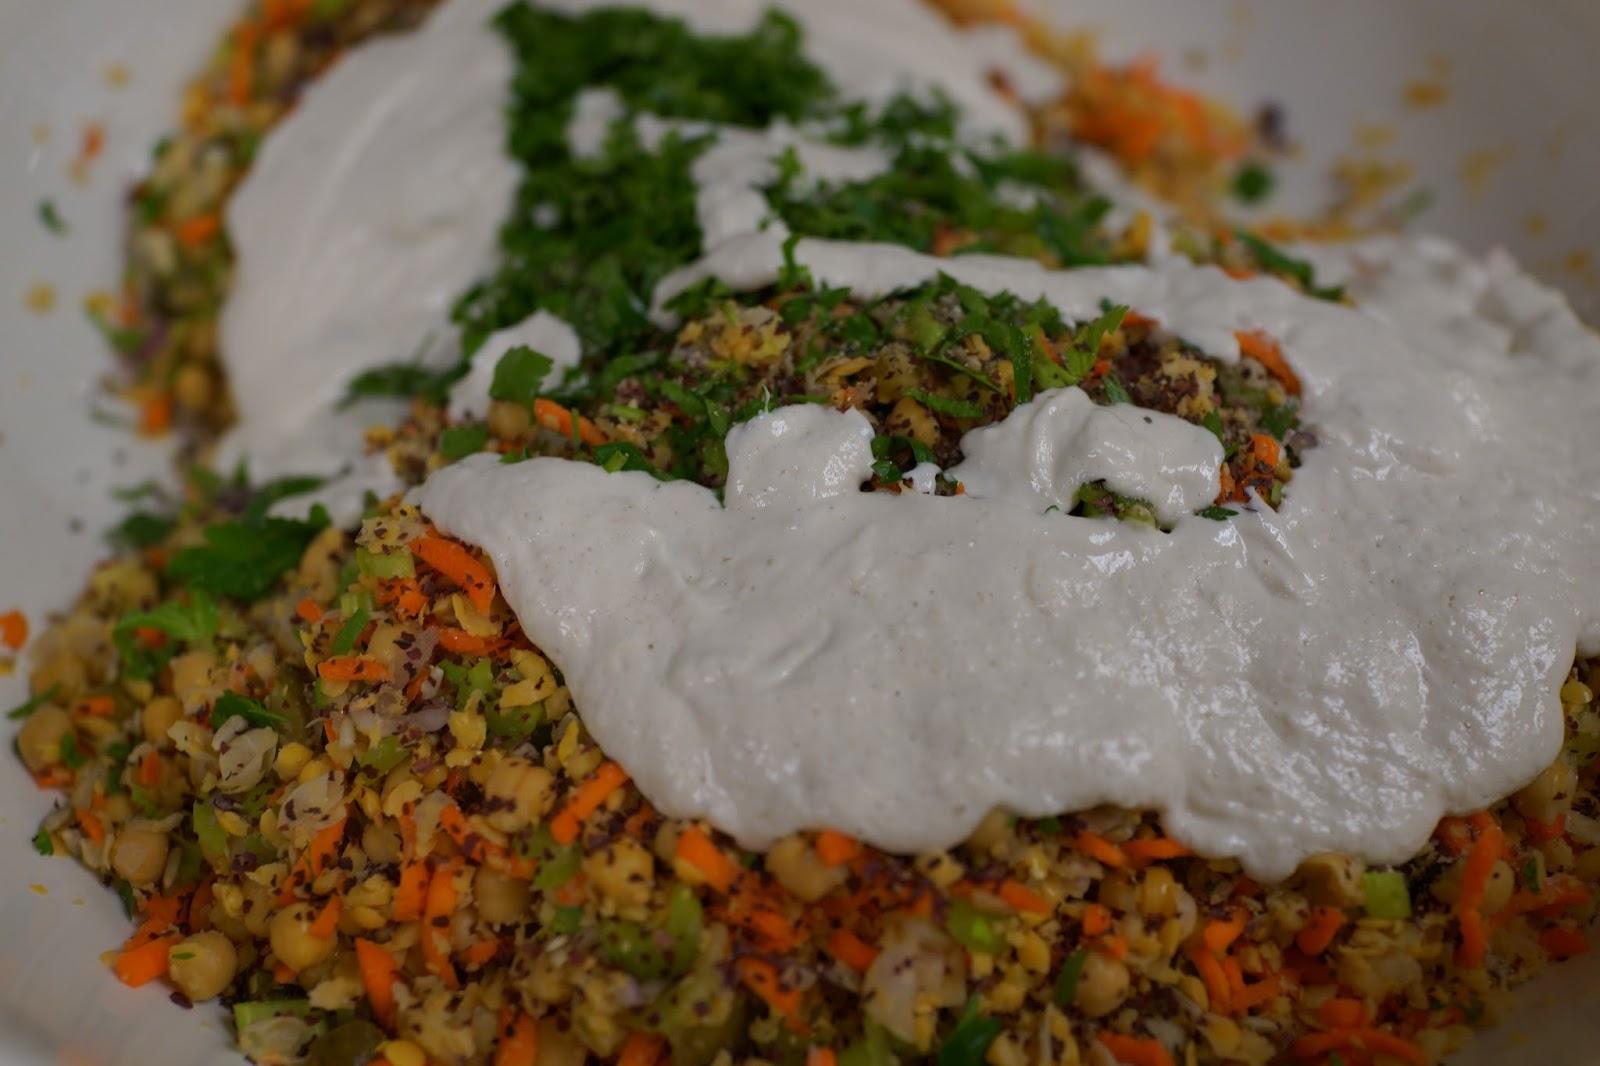 Chickpea mock tuna Salad